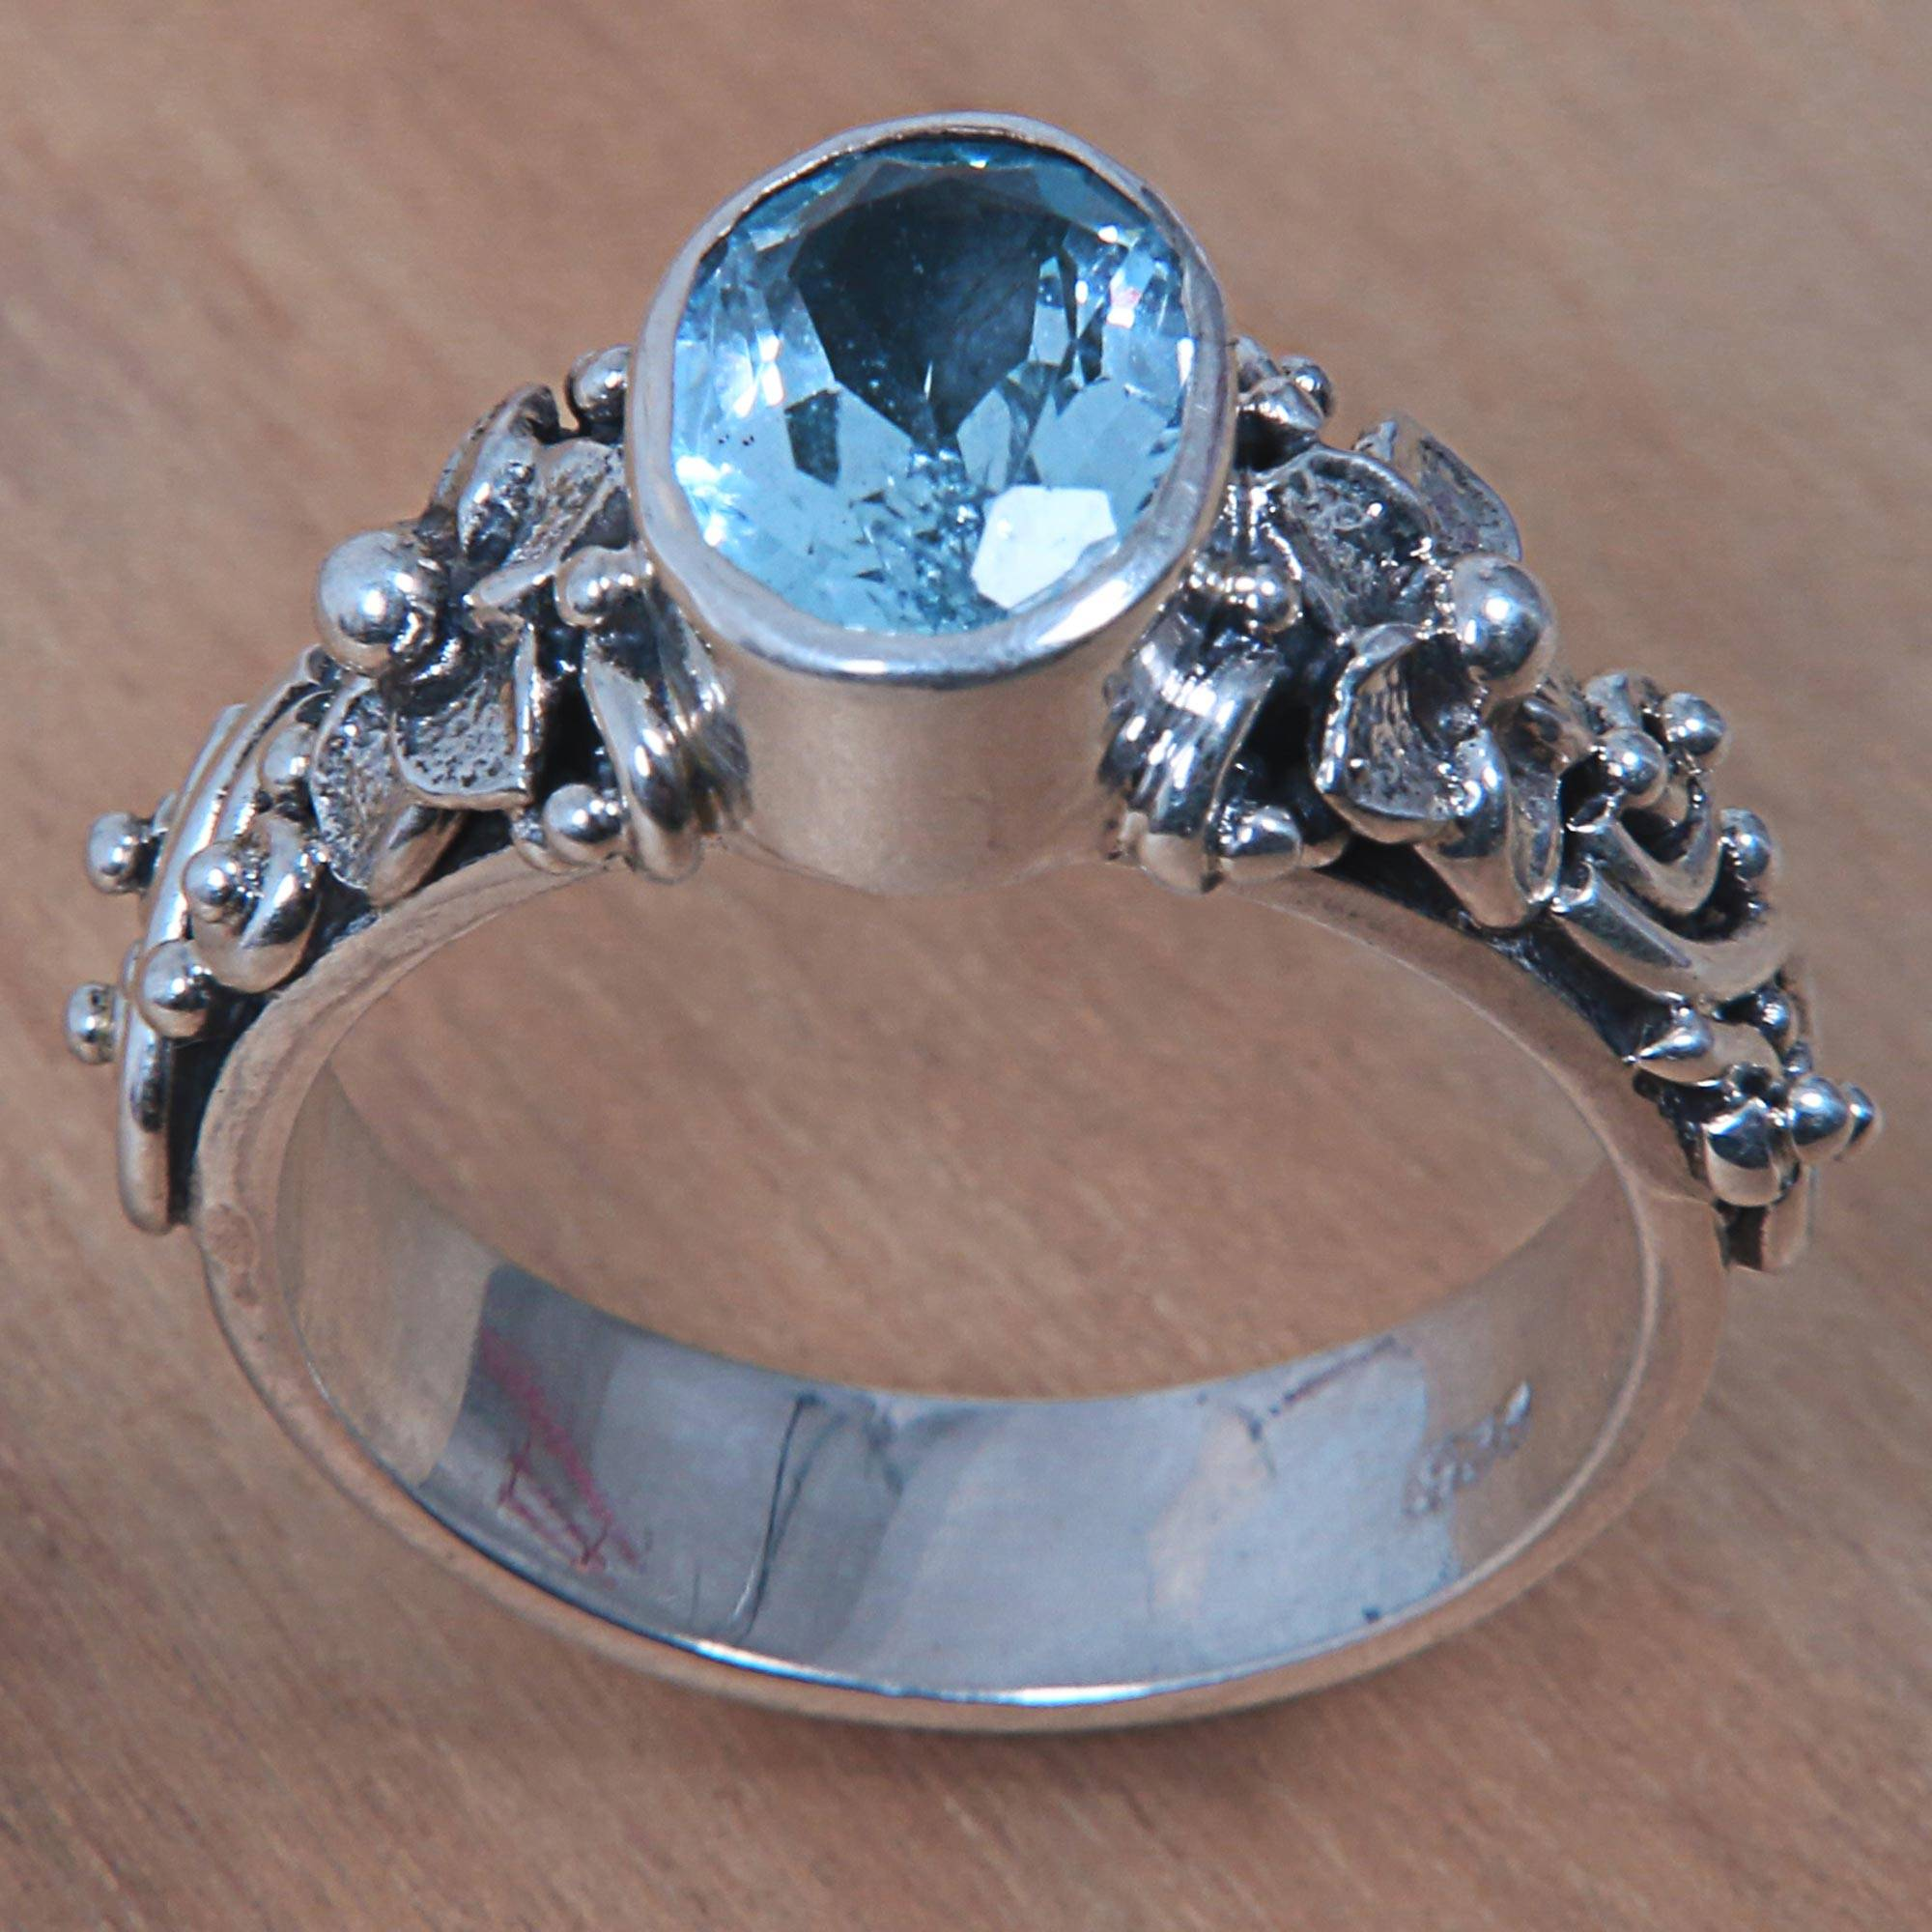 Desginer Handmade Jewellry Blue Topaz Quartz Silver Plated 8 Grams Earring 1.5 Long